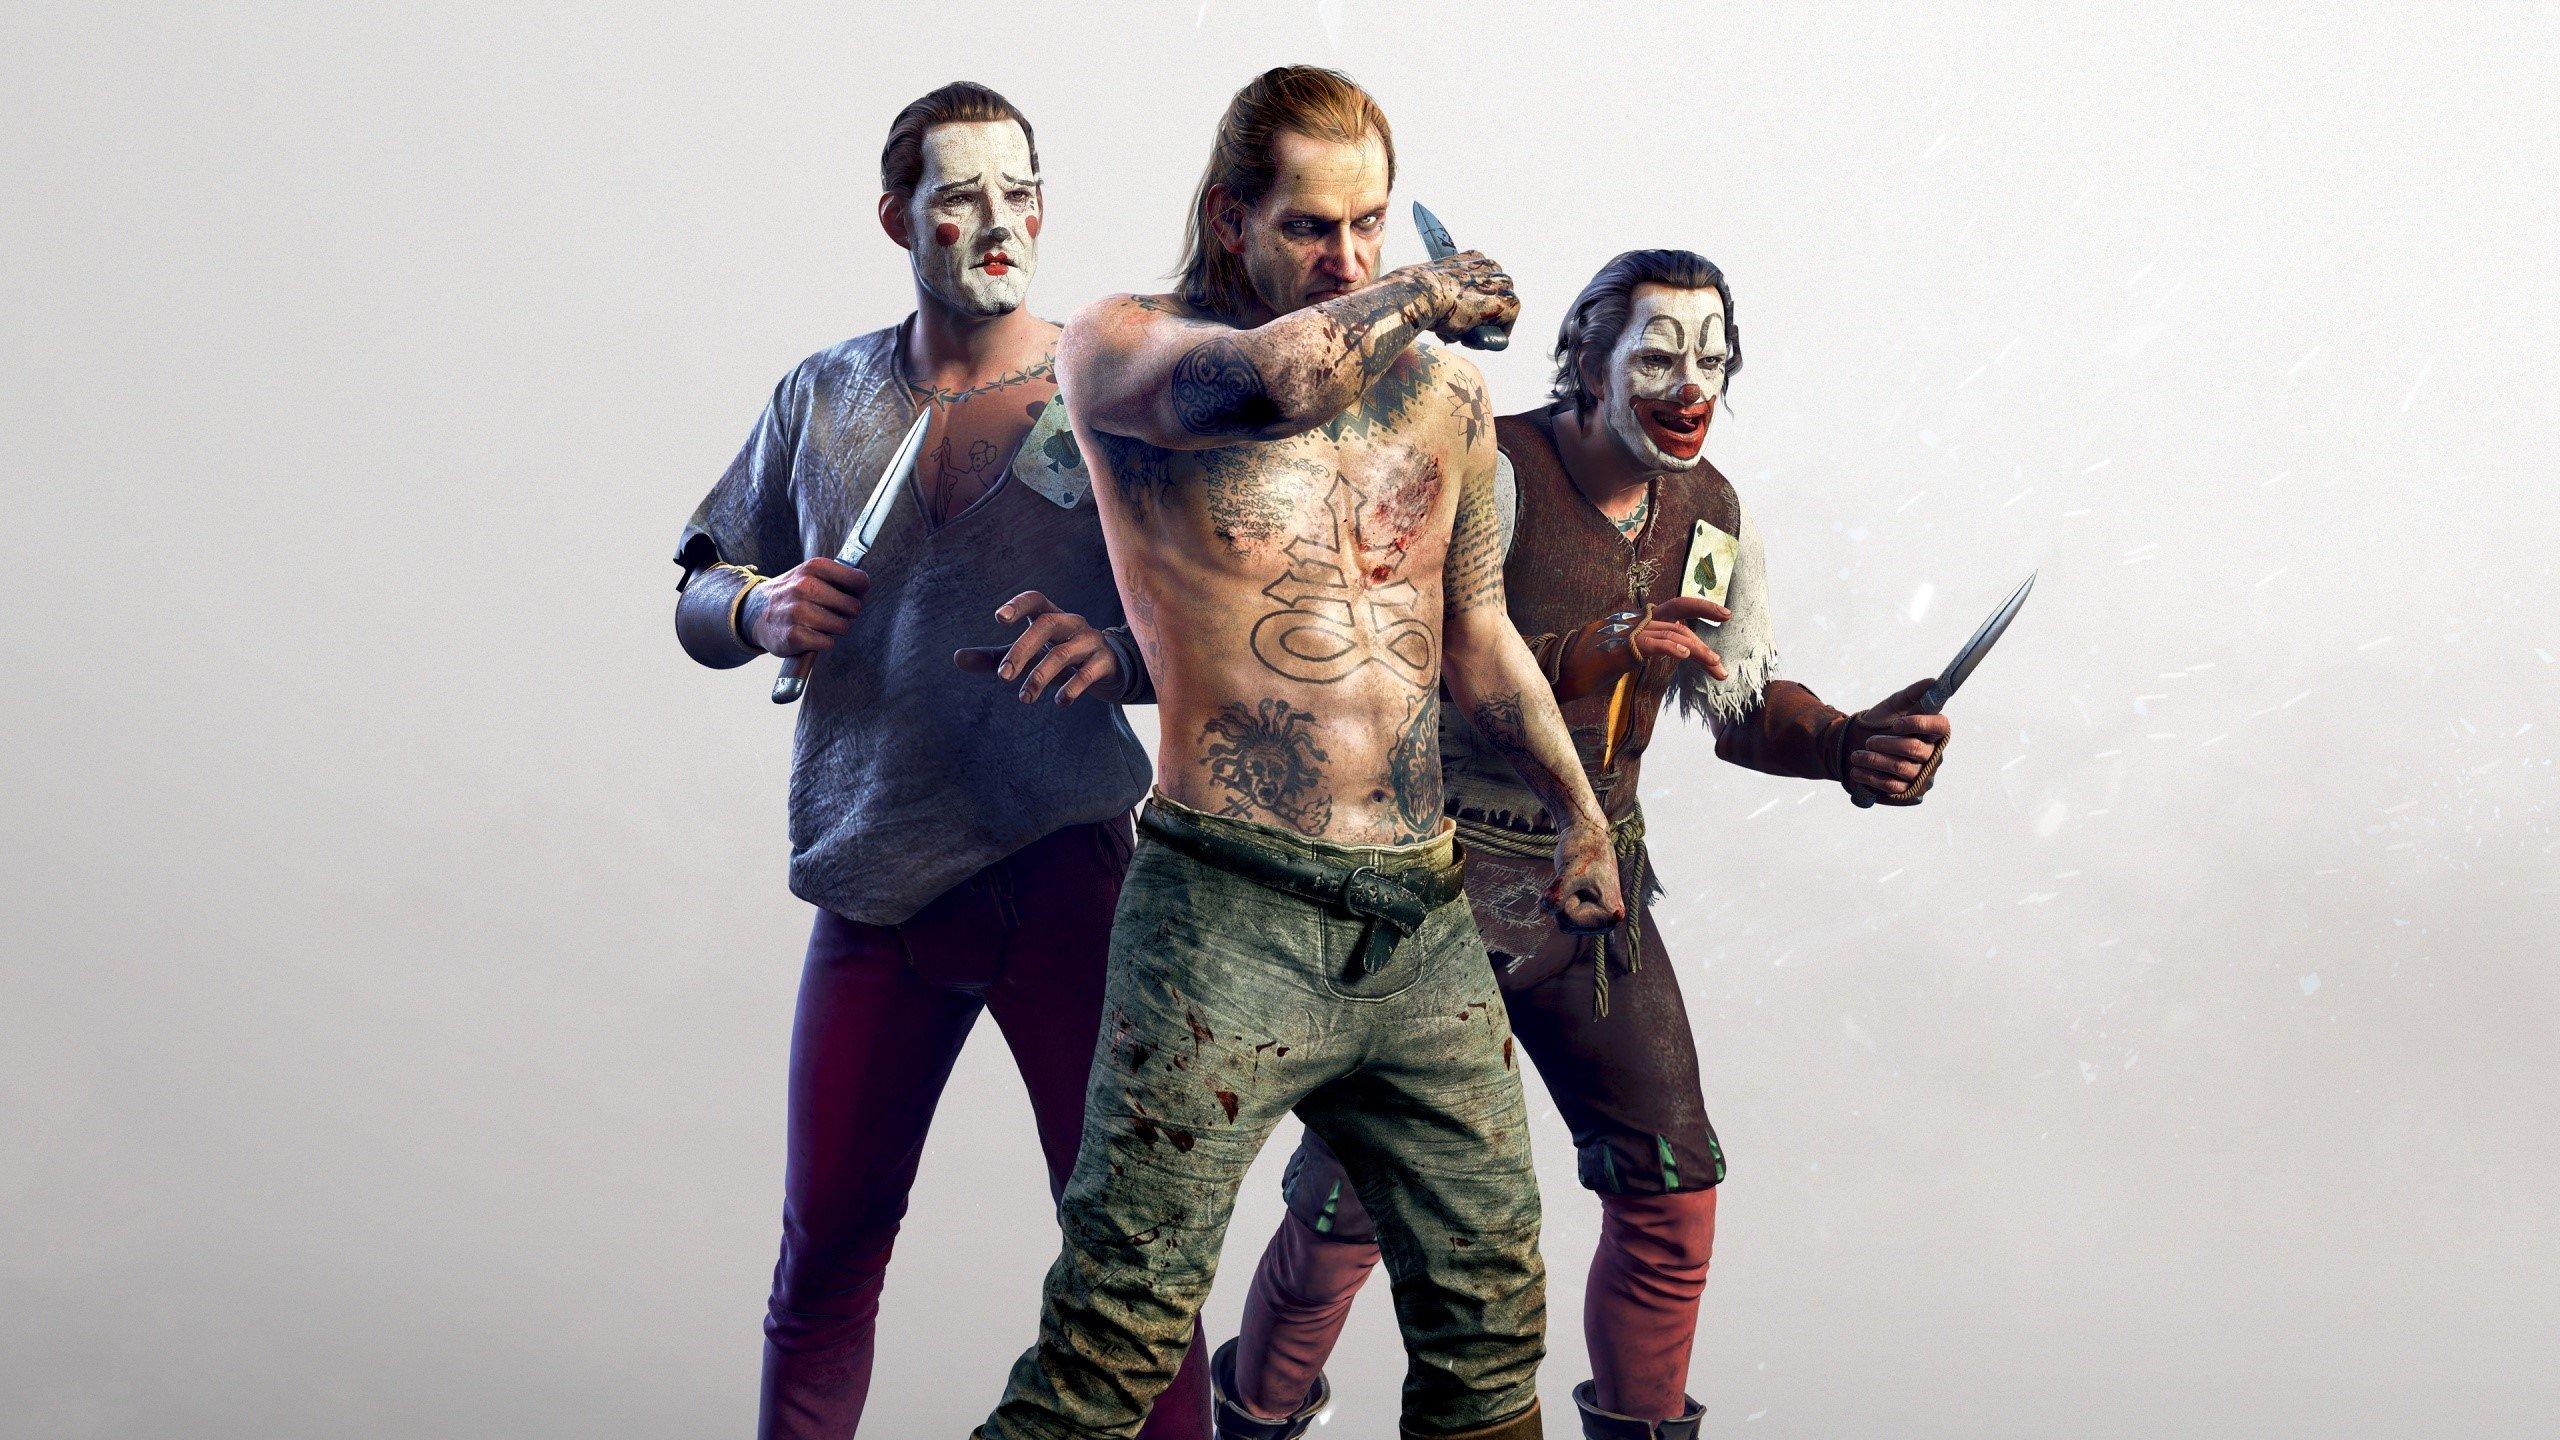 Fondos de pantalla The Joker de The witcher 3 Winter Hunt